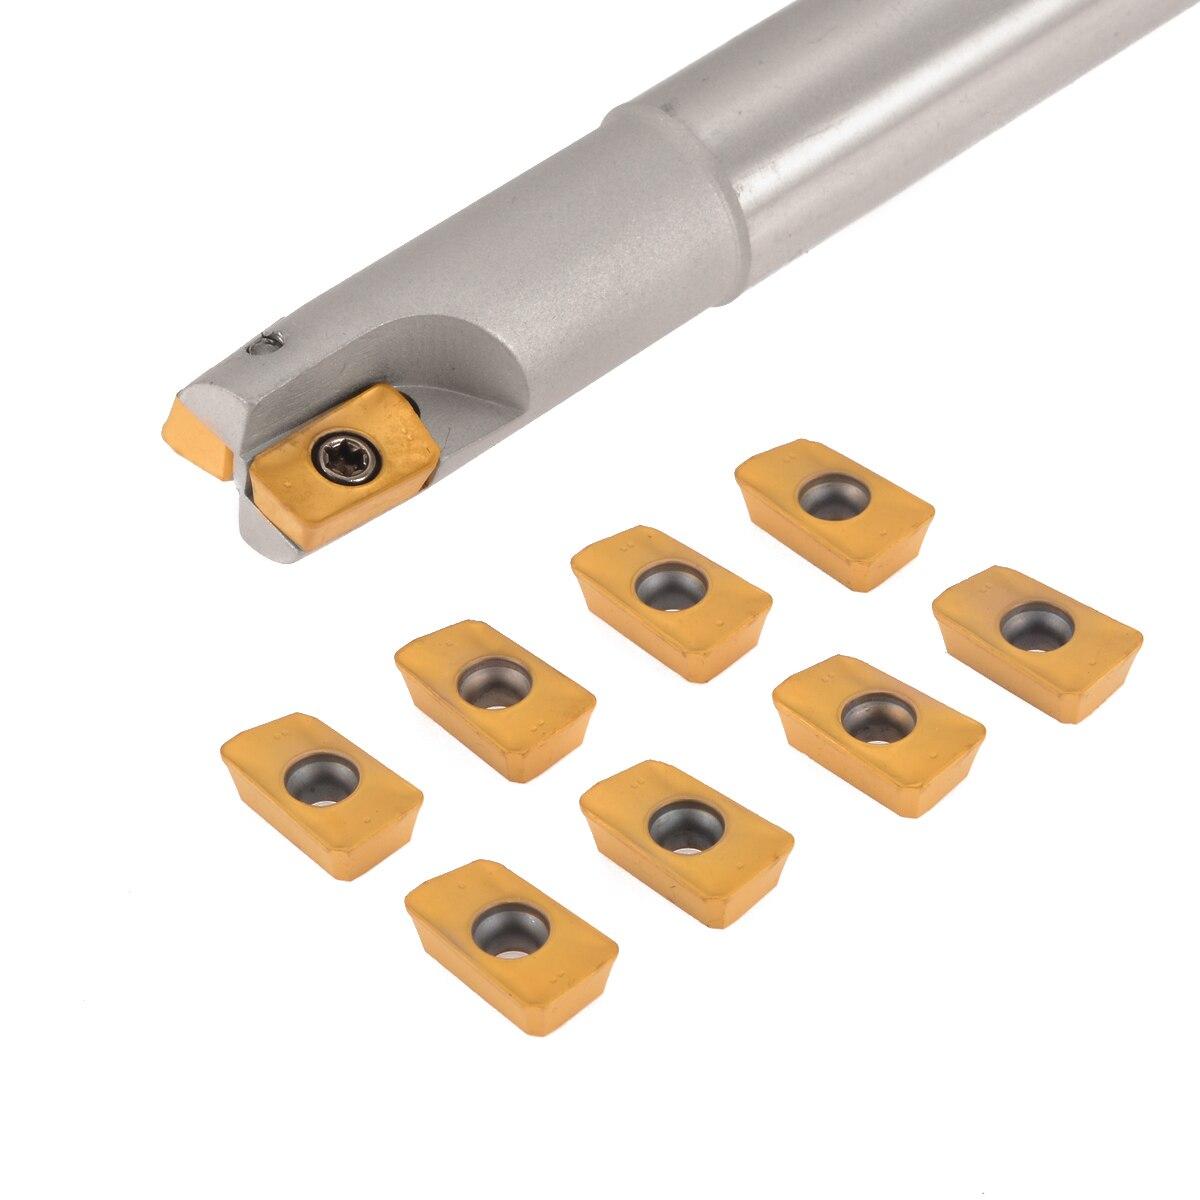 10PCS APMT1135PDERDP Insert 1PCS BAP 300R C19-20-150 Milling Cutter Holder